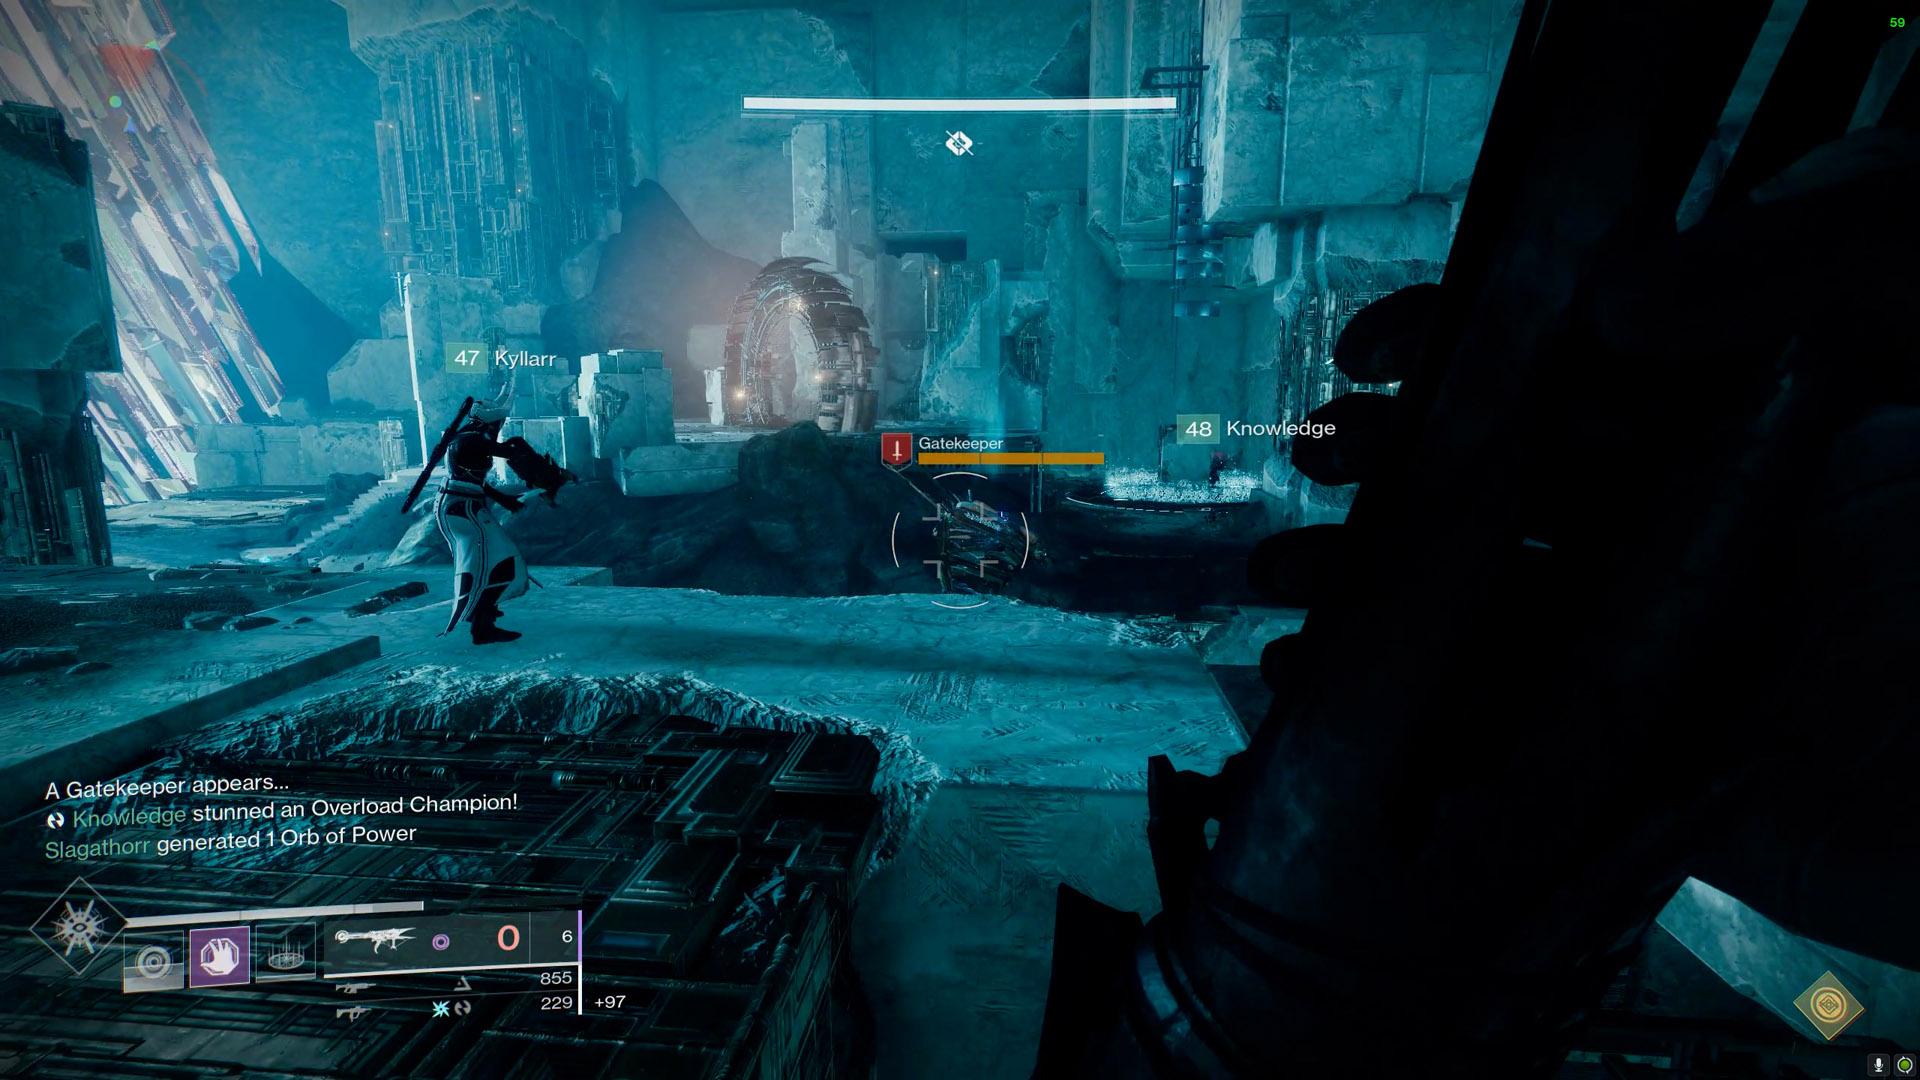 destiny 2 vault of glass gatekeeper guide